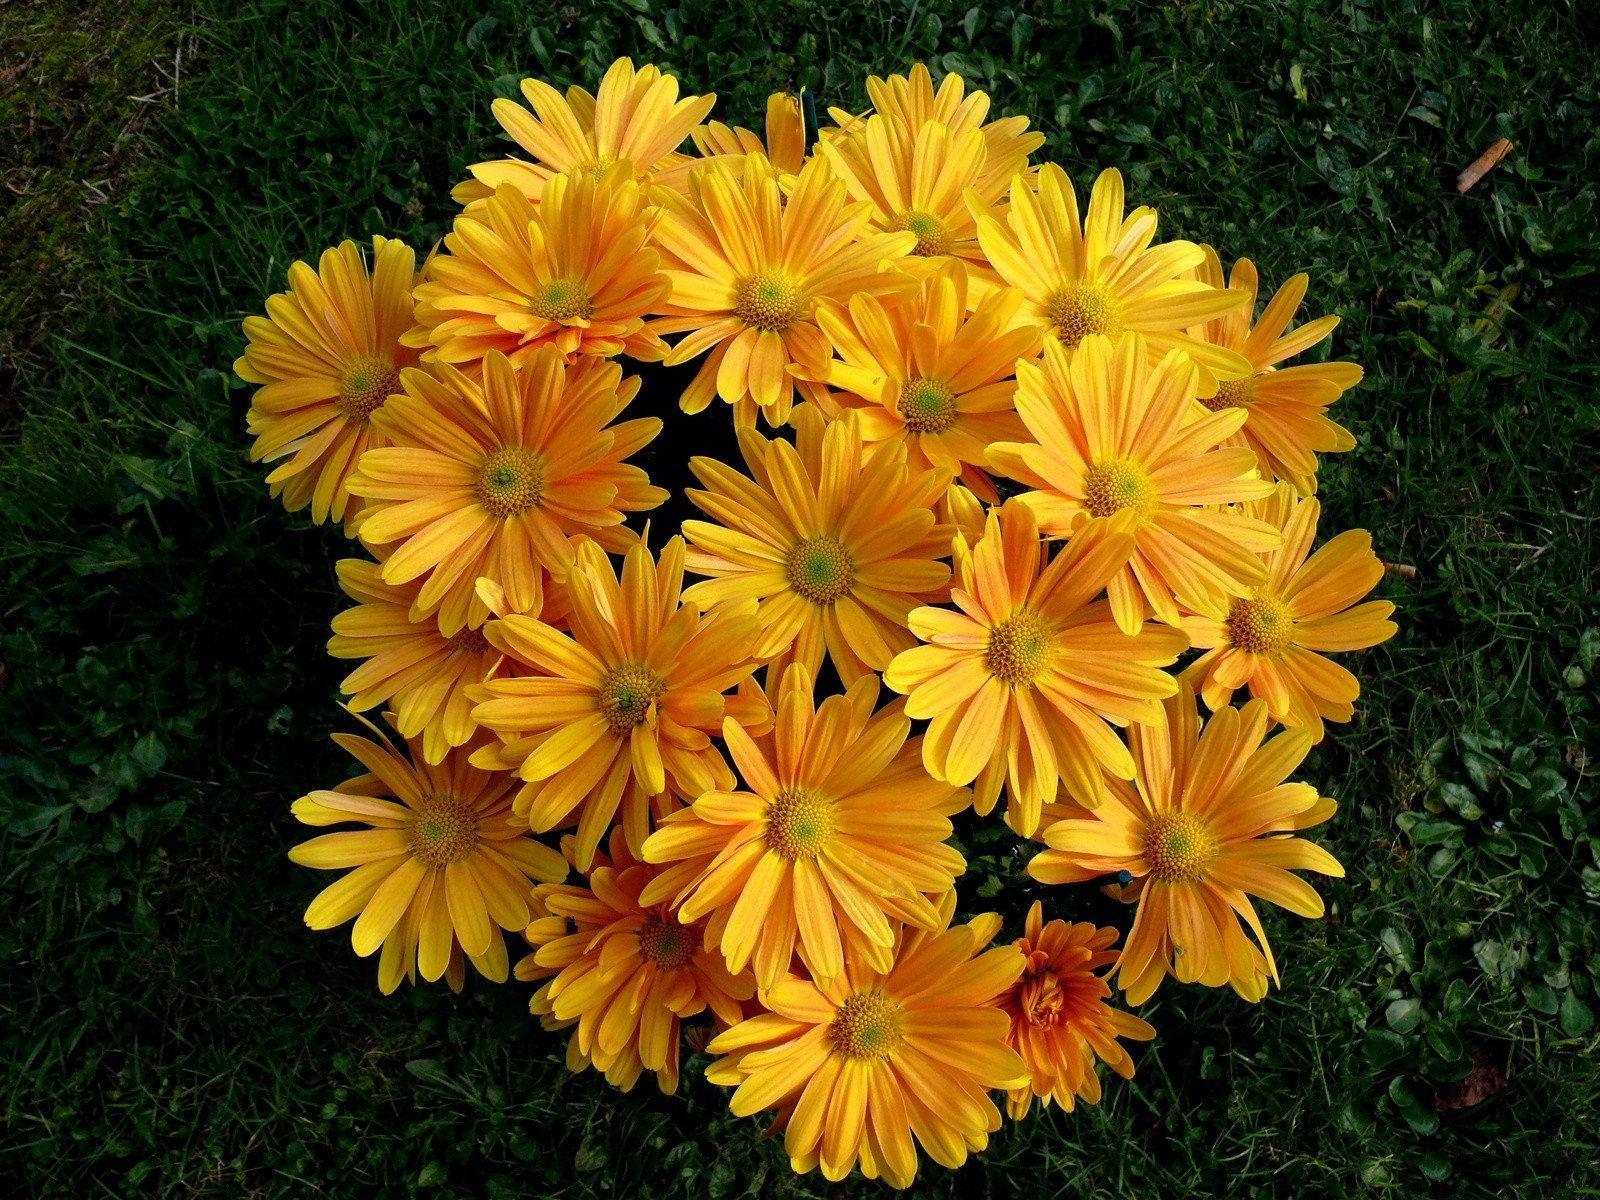 hinh anh hoa cuc dep 63